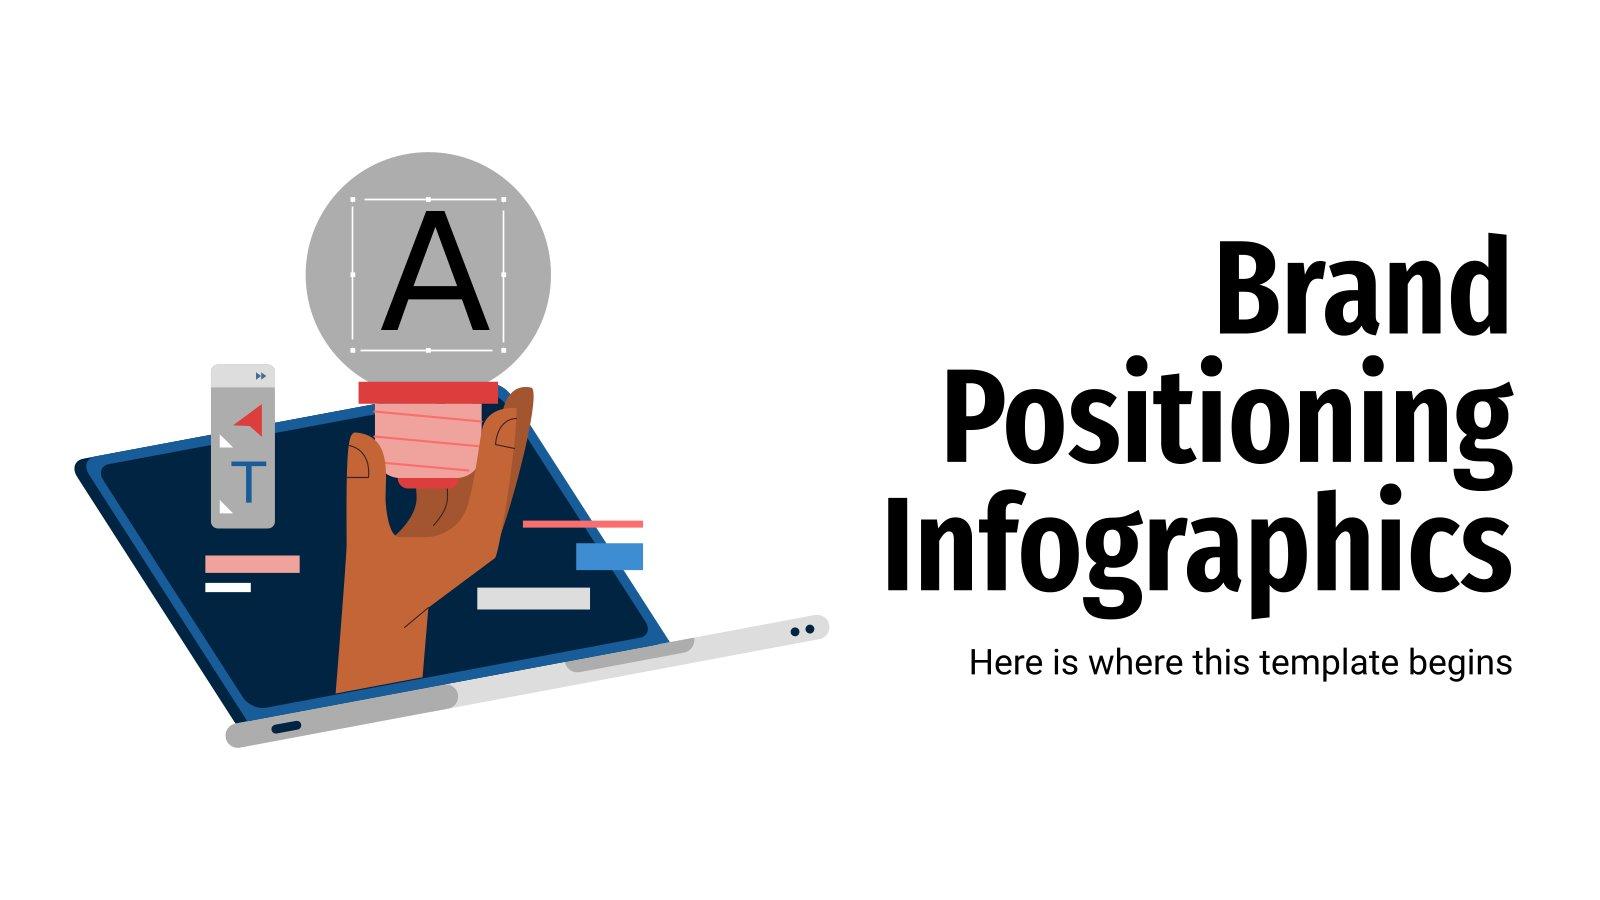 Brand Positioning Infographics presentation template